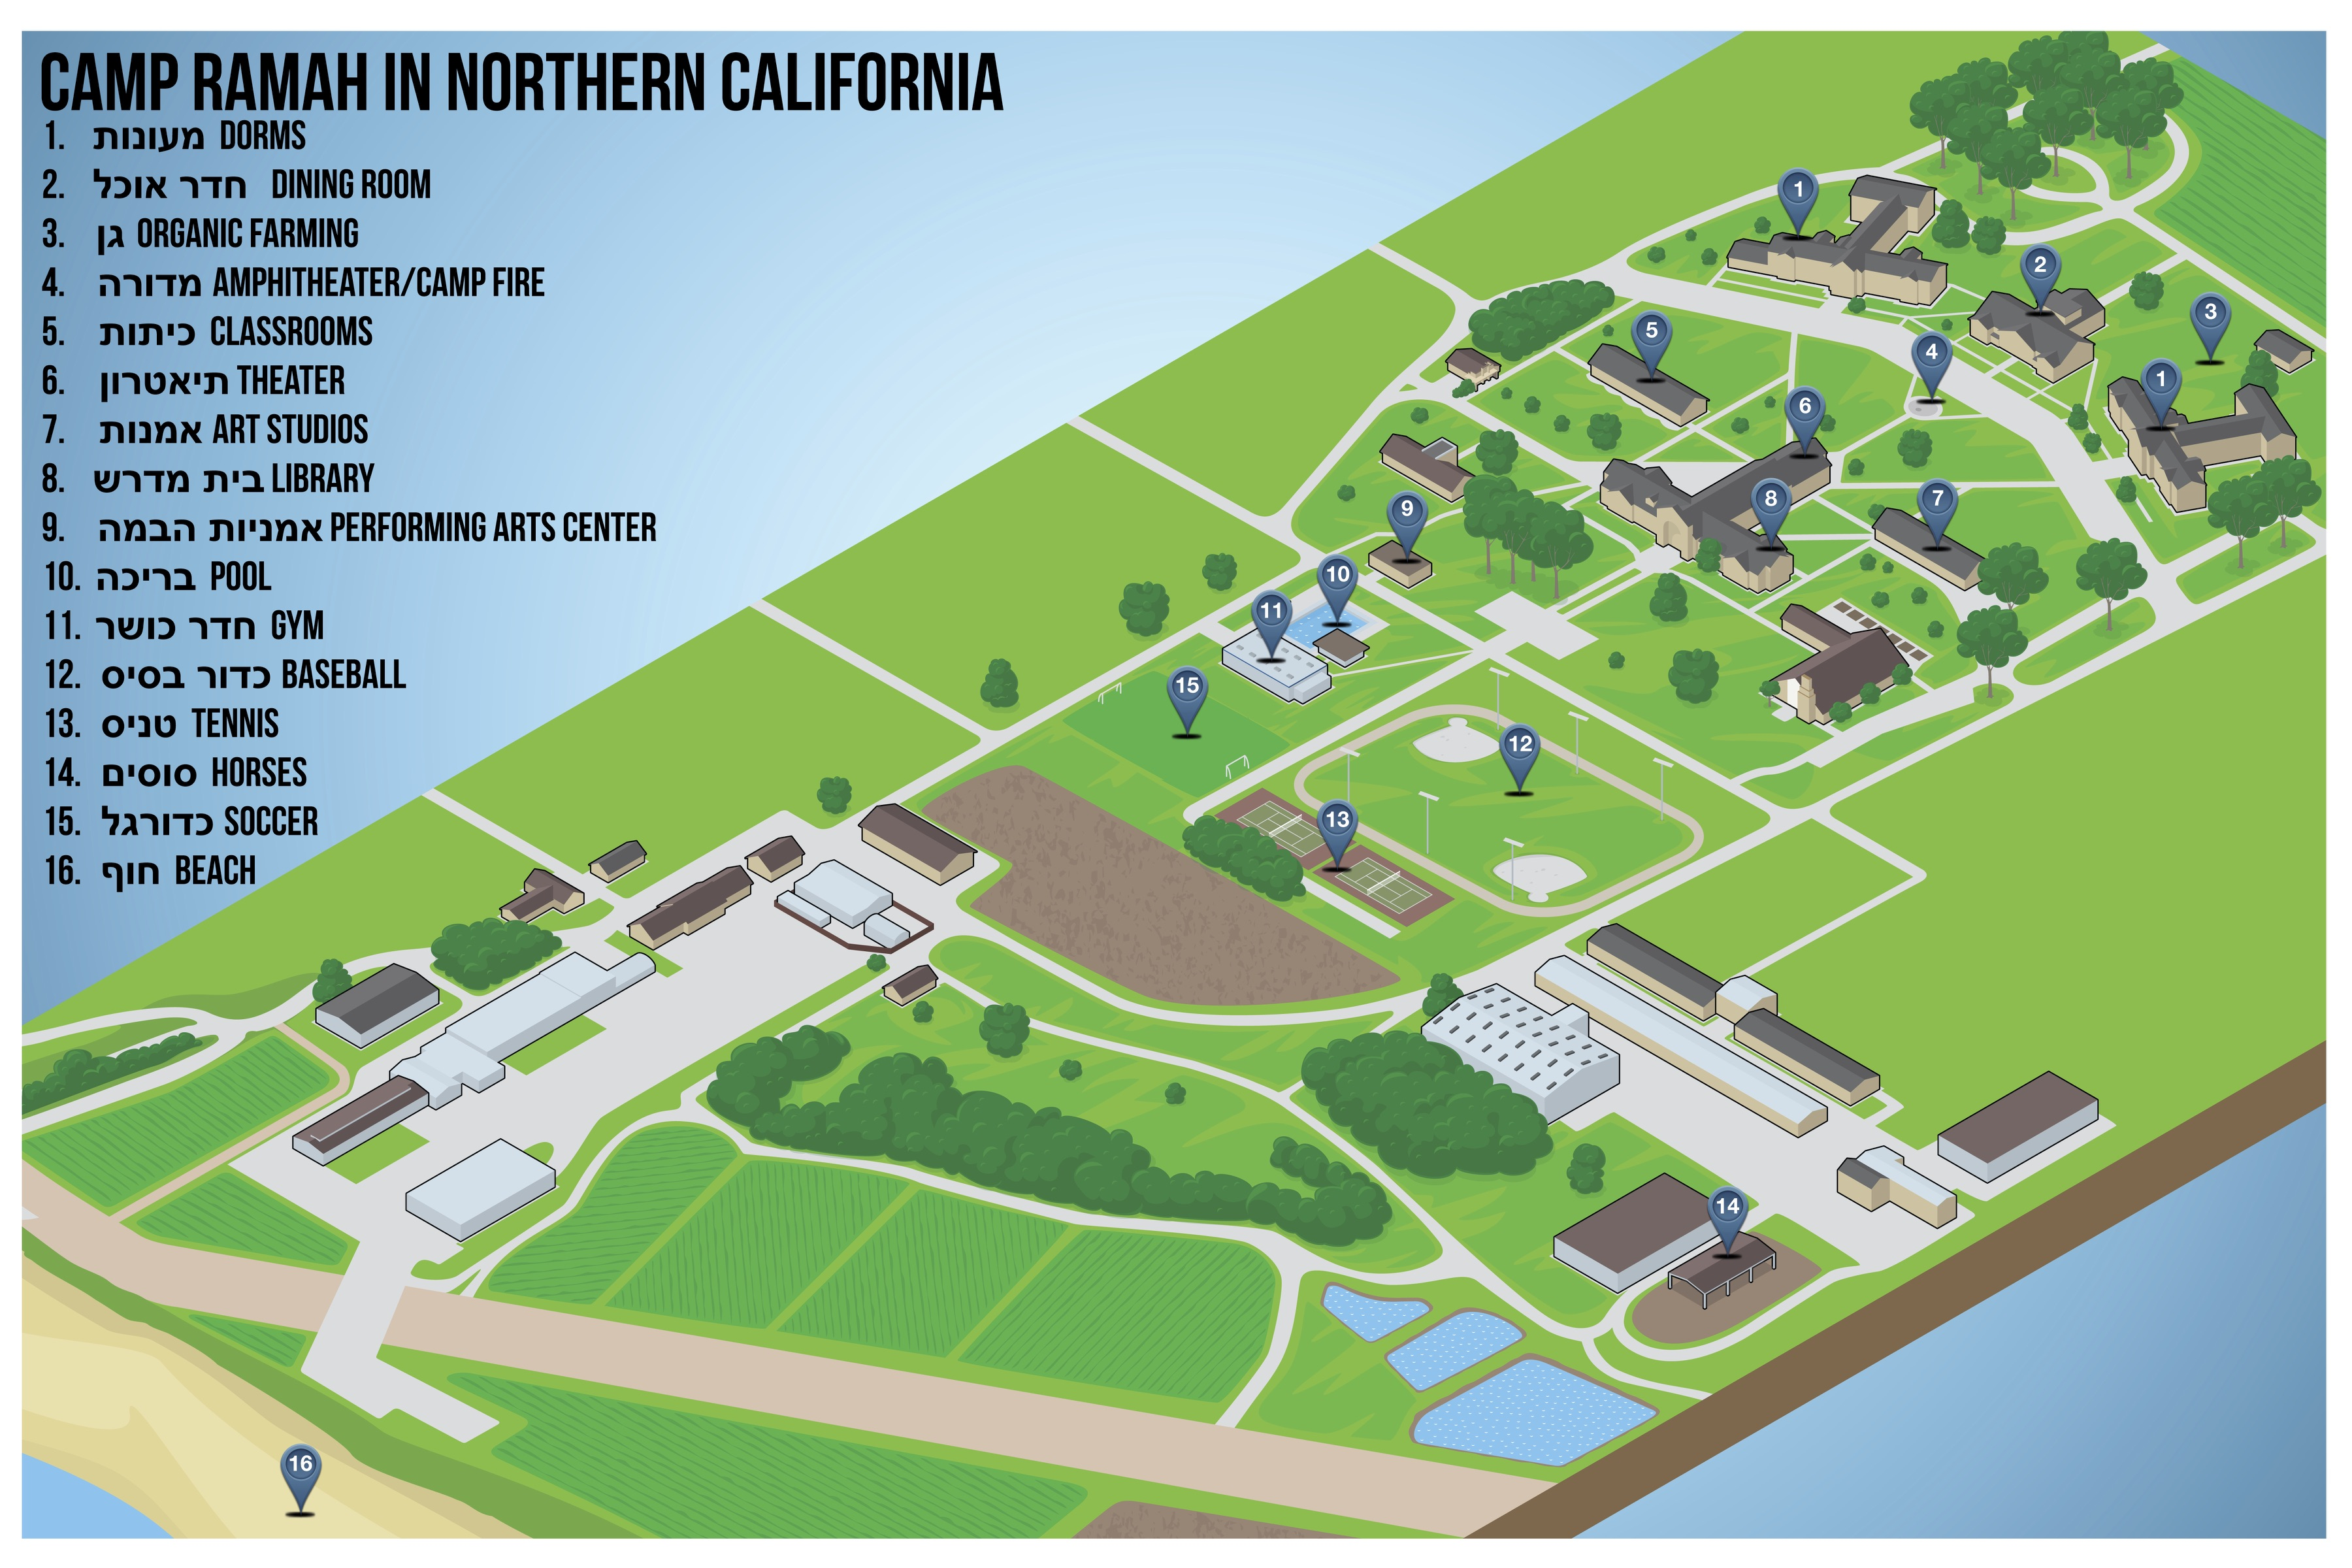 Facilities | Camp Ramah Northern California on